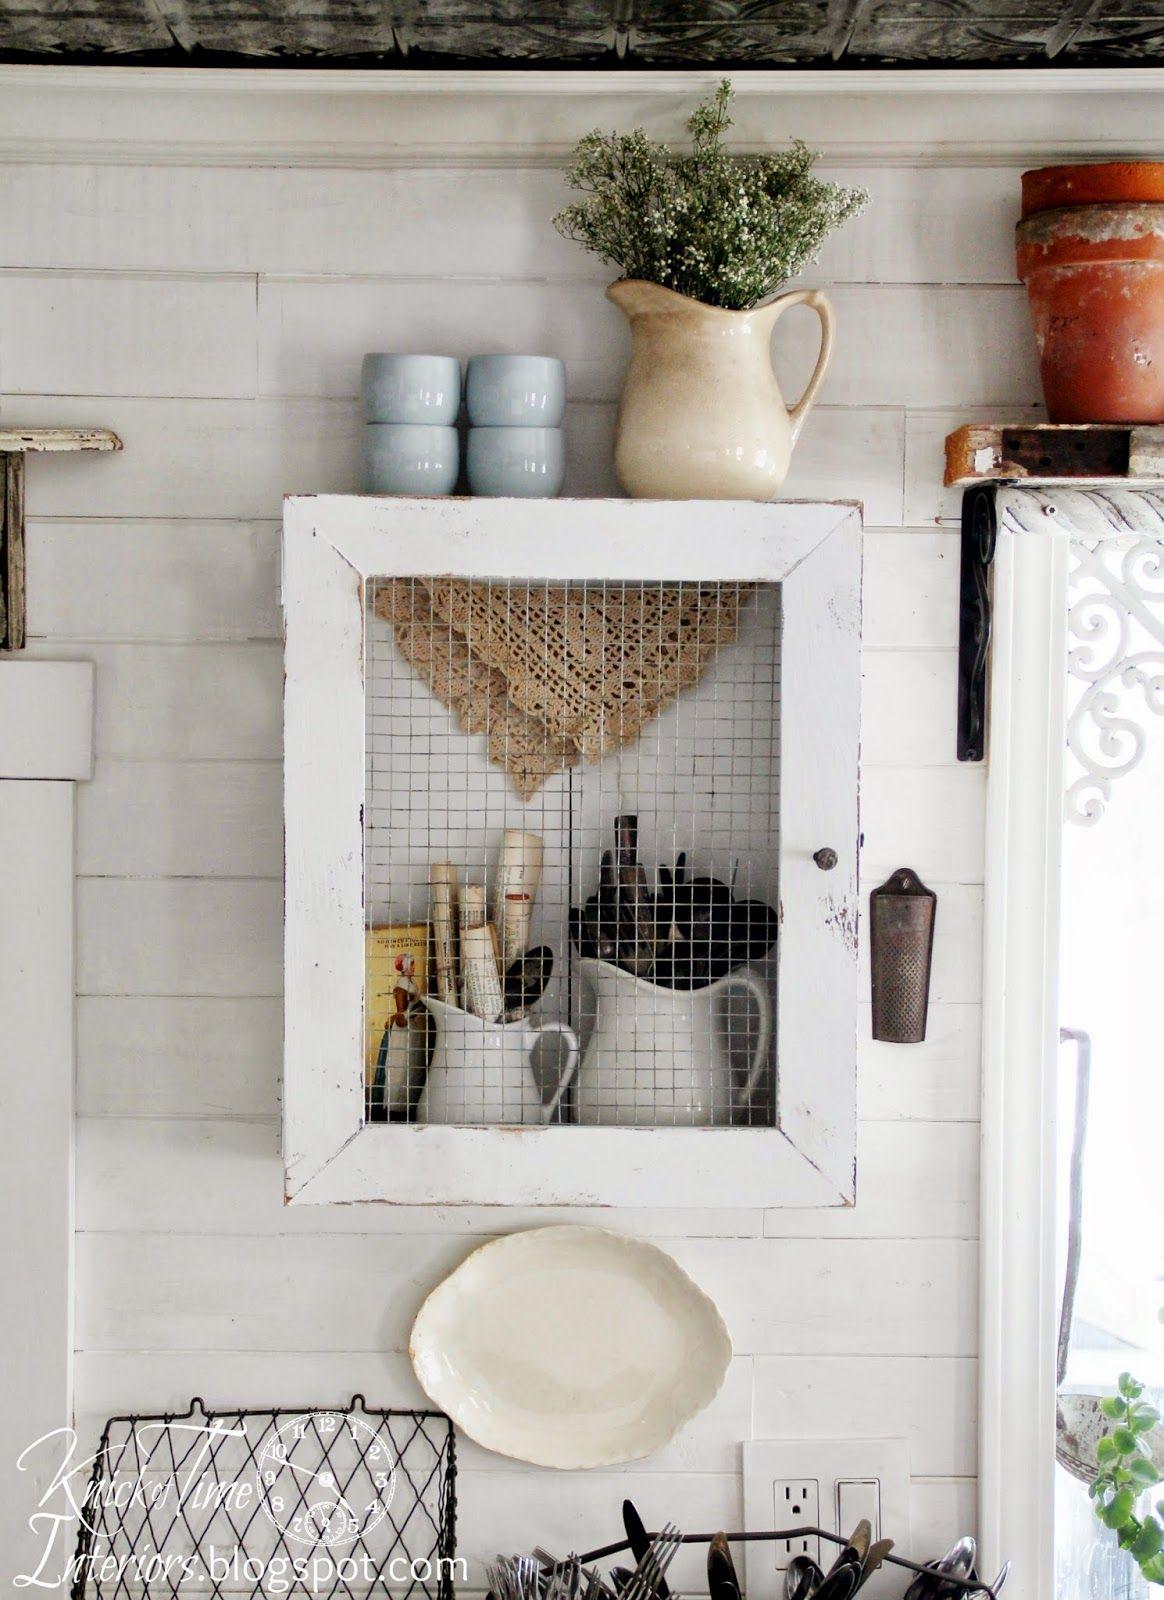 DIY Kitchen Utensil Organizers - Kitchen Utensil Organizing Ideas